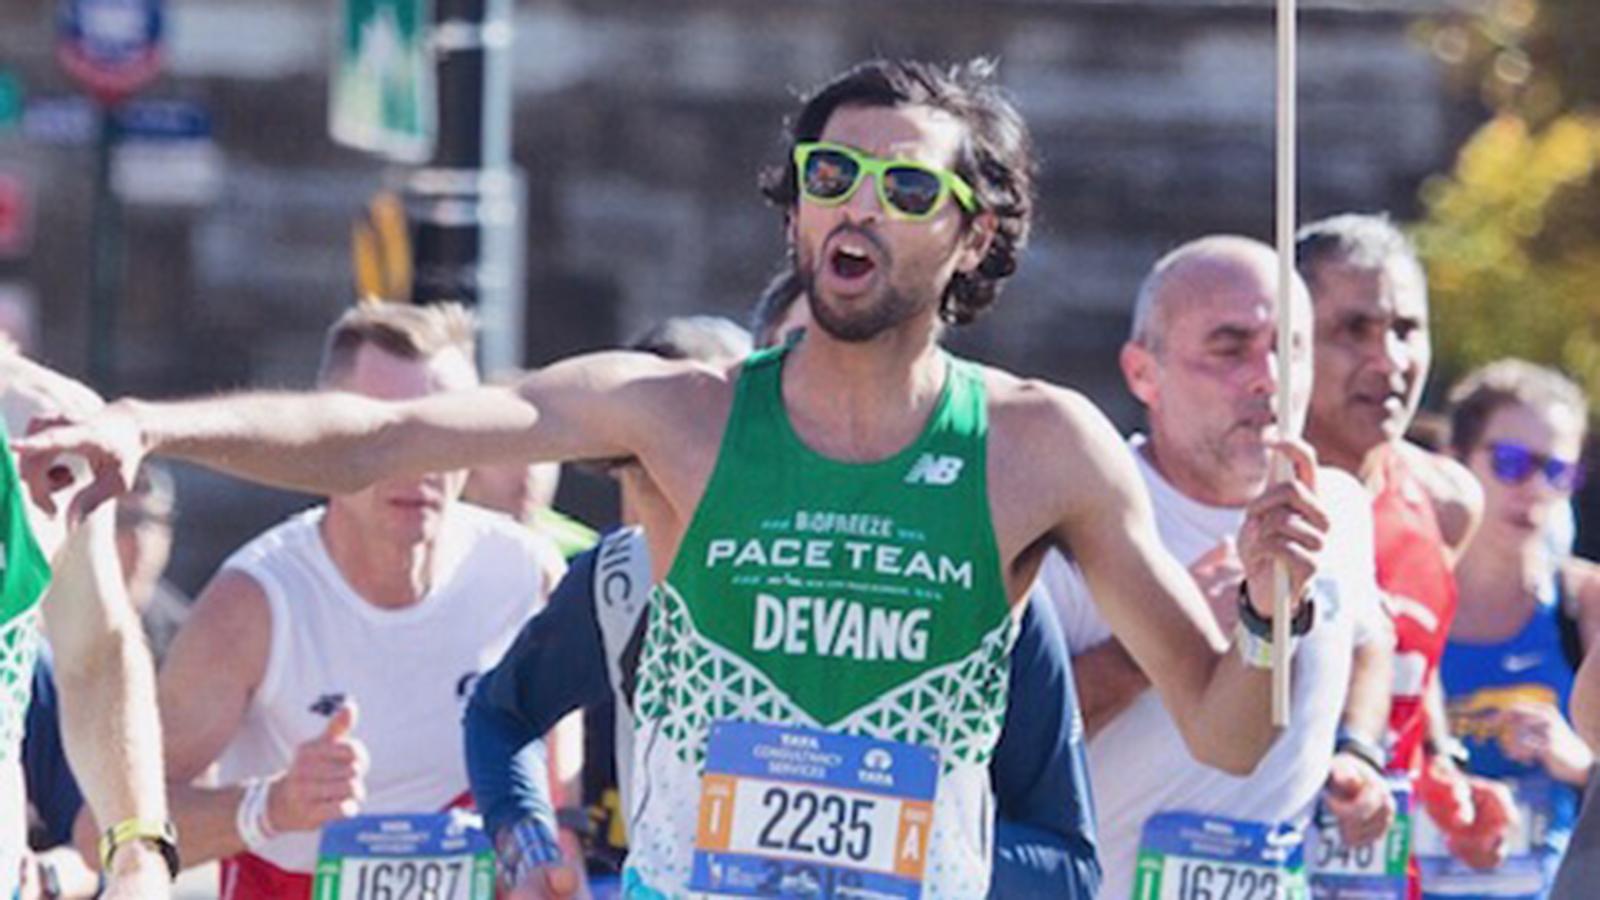 NYRR Pace Team member Devang Patel